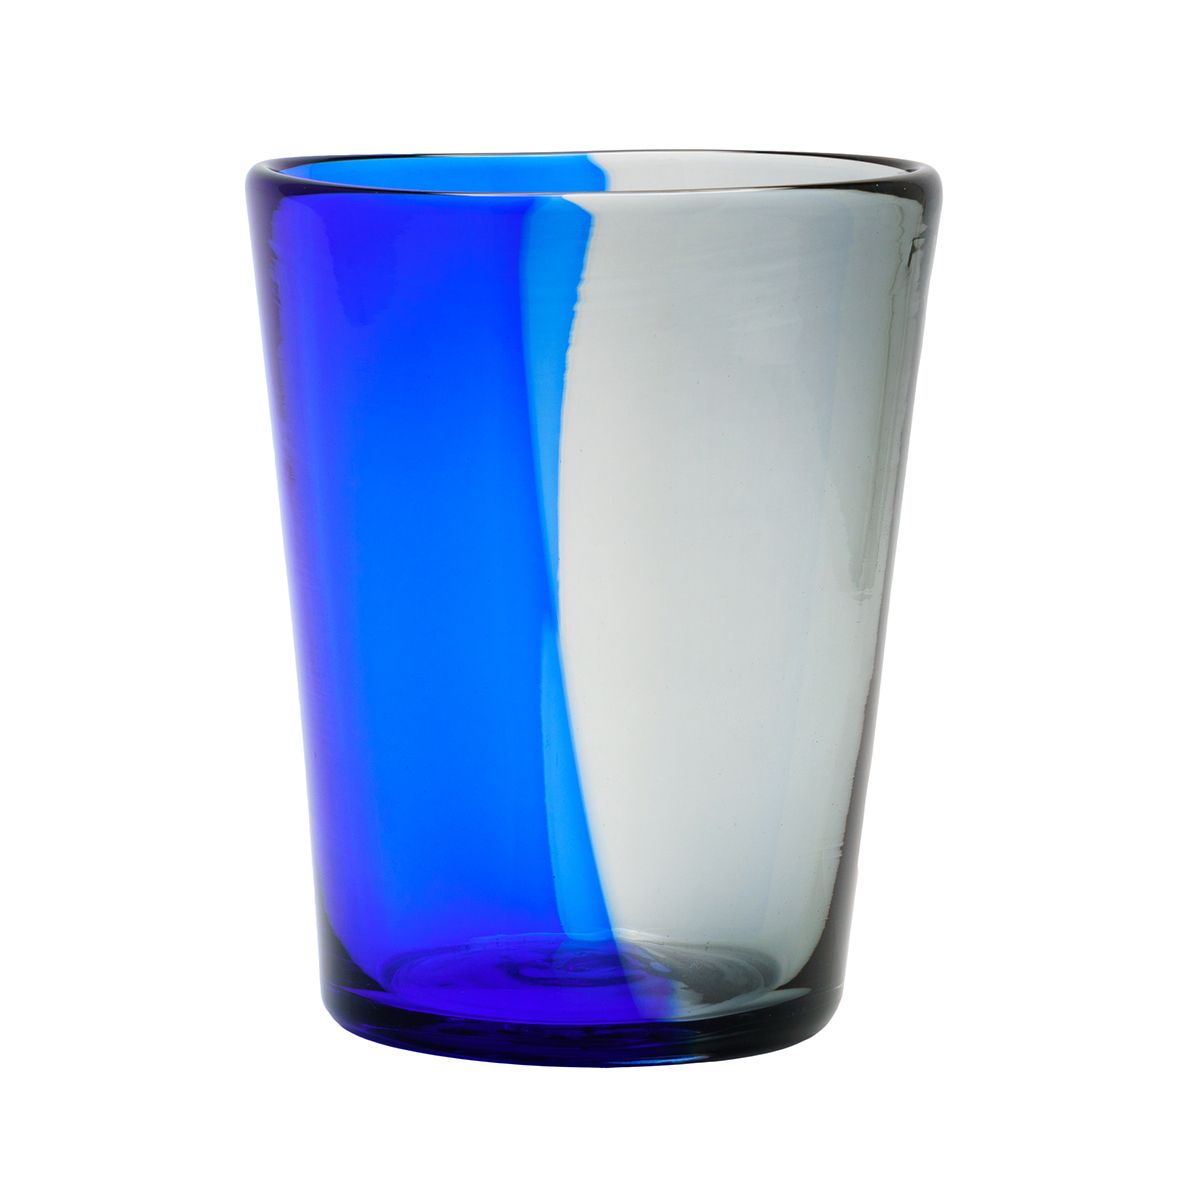 rothko blue